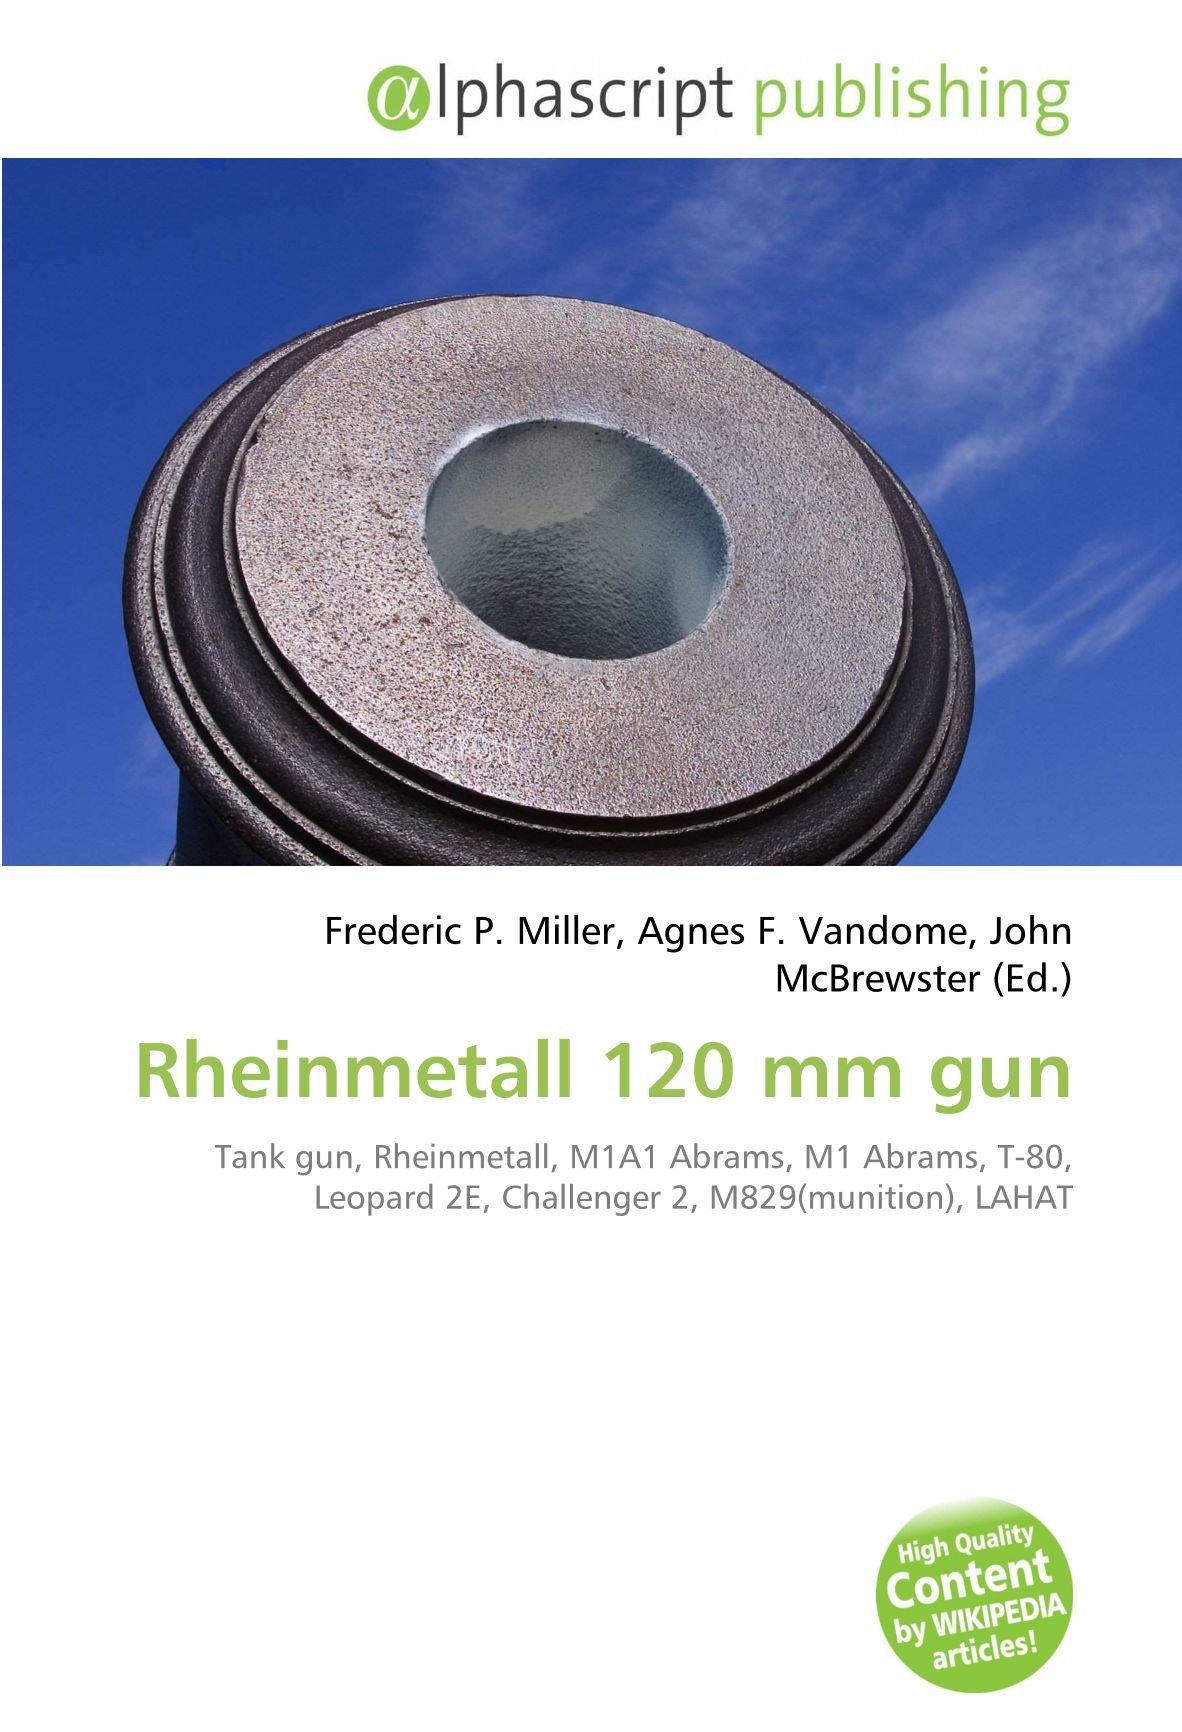 Rheinmetall 120 MM Gun: Amazon.es: Frederic P Miller, Agnes F Vandome, John McBrewster: Libros en idiomas extranjeros